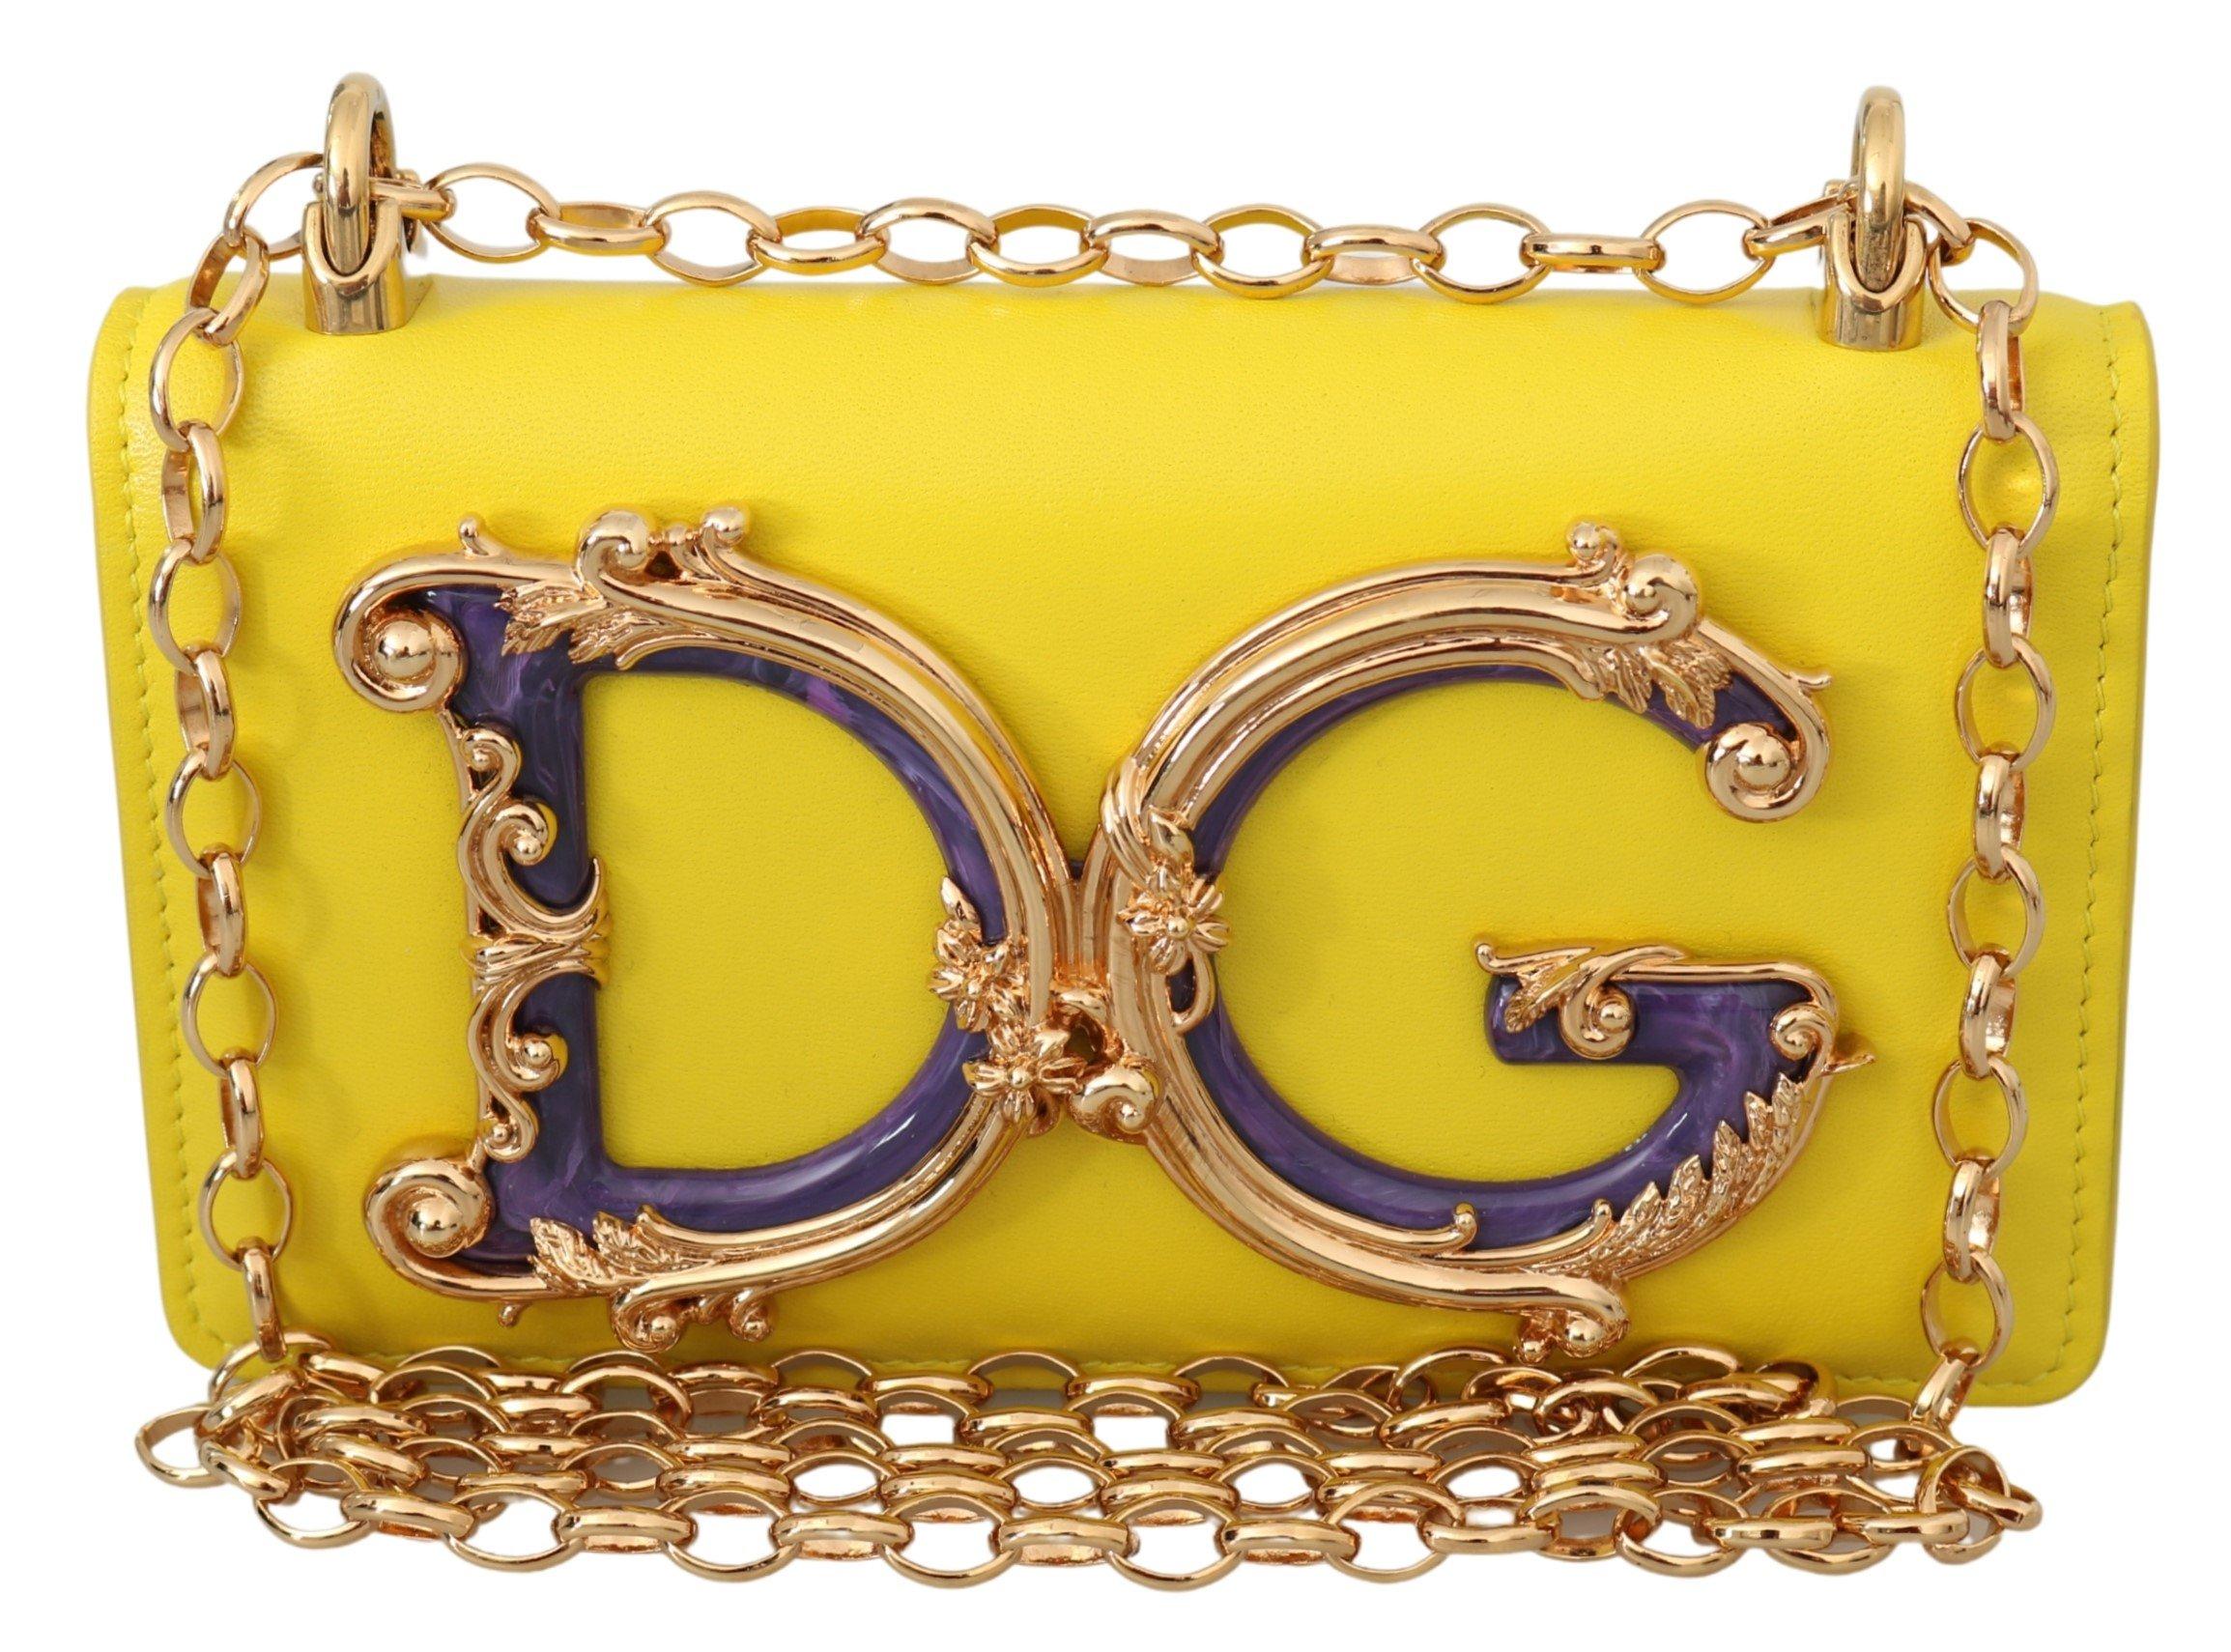 Dolce & Gabbana Women's Leather Logo iPhone X Cover Crossbody Bag Yellow VAS9908